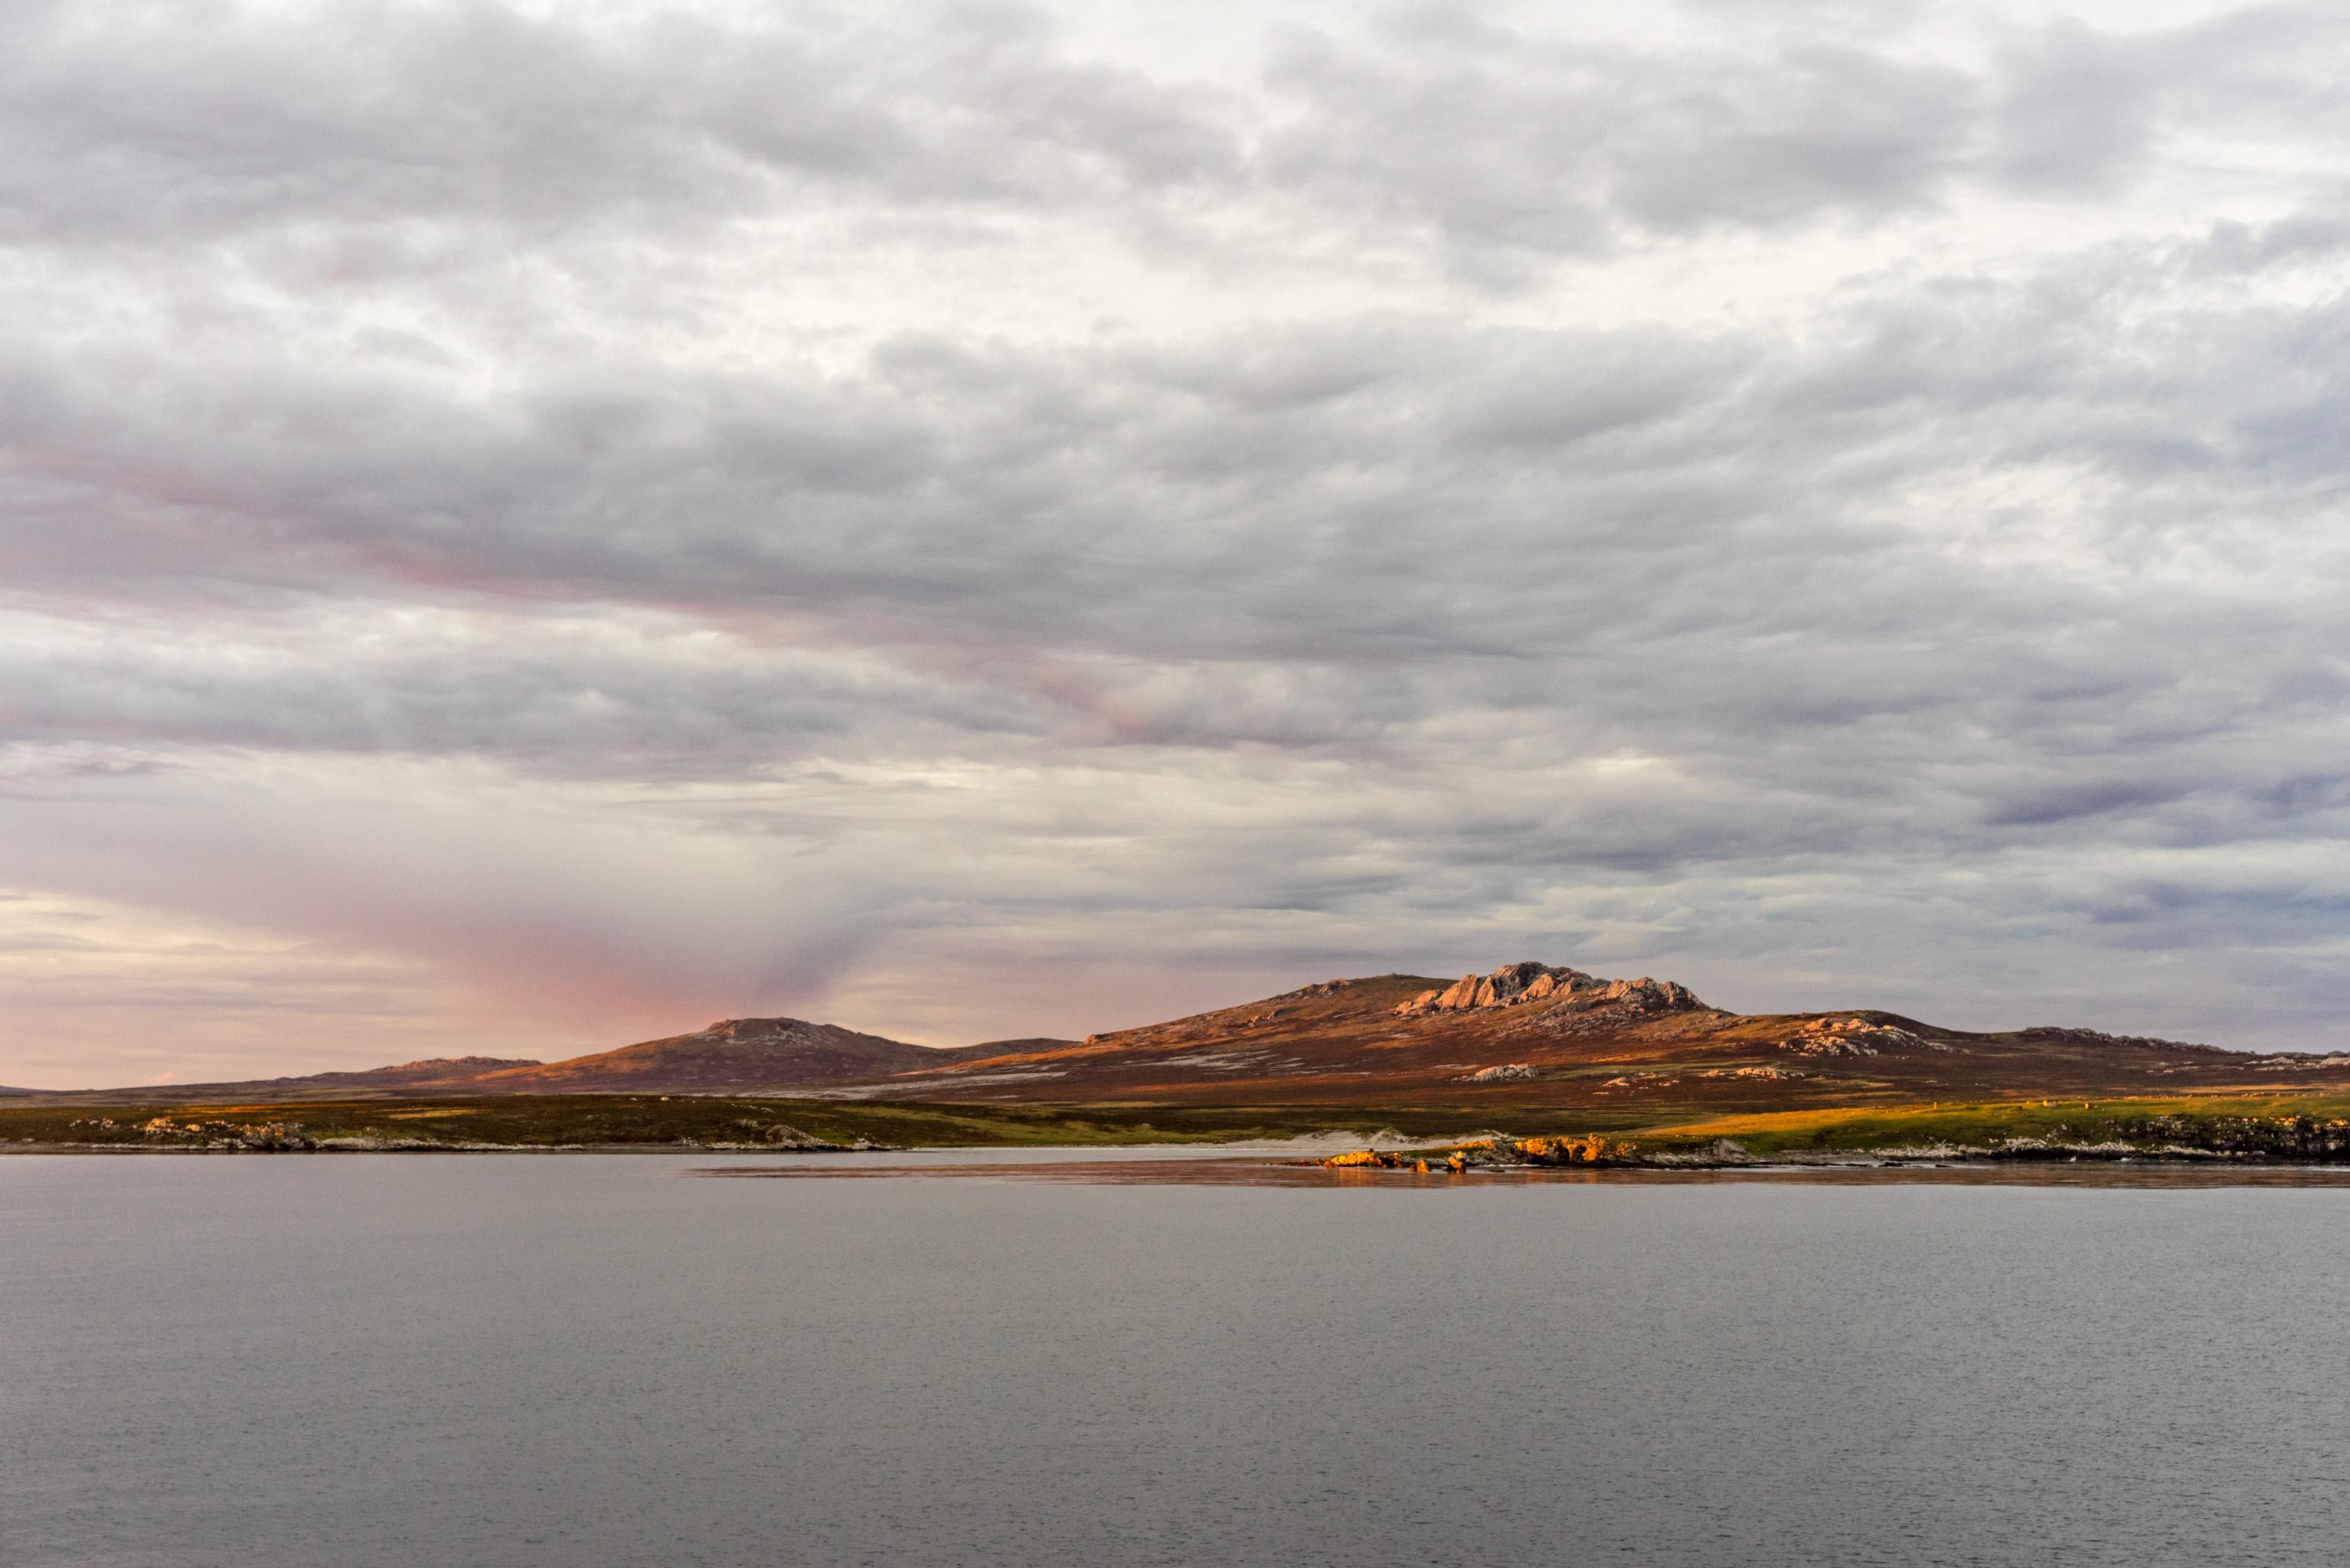 M133: Falklands